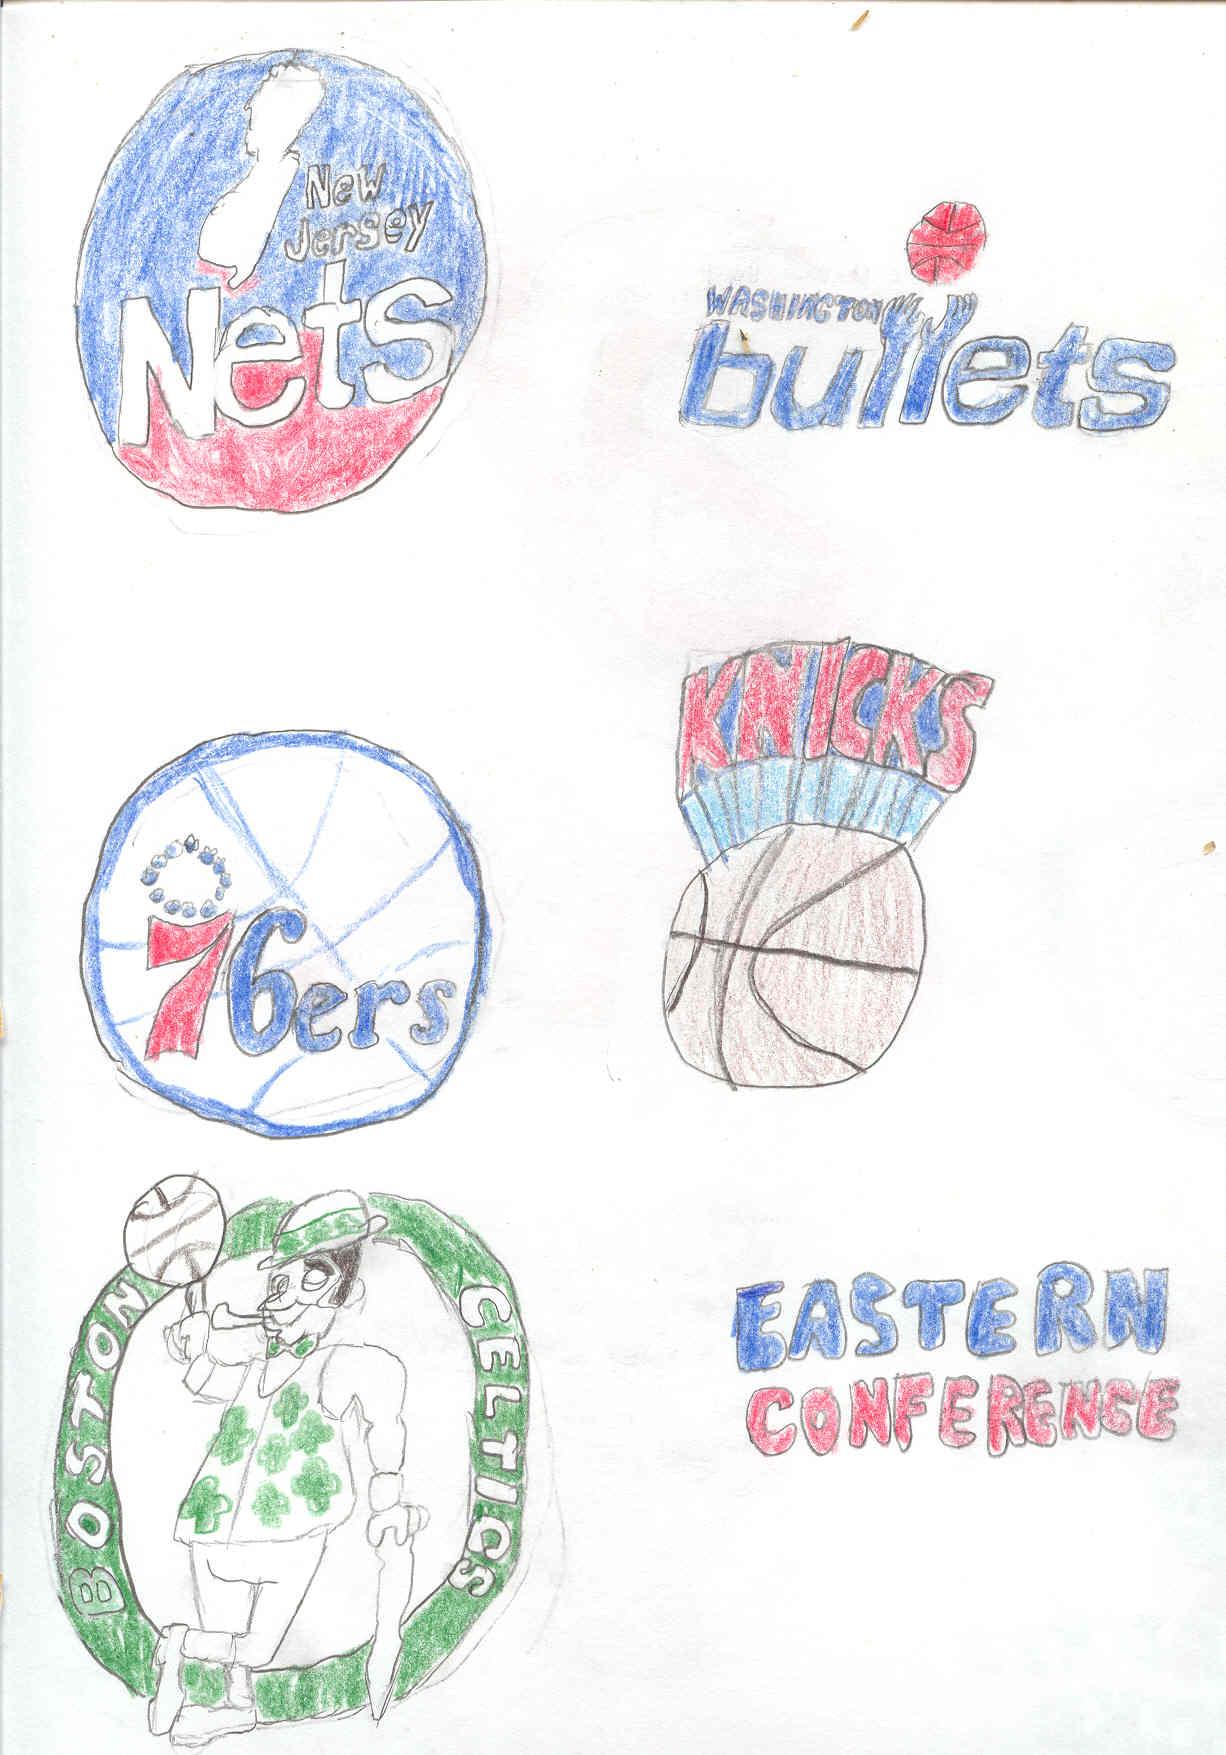 1226x1755 Old Nba Logos 2 By Sam Gwosdz